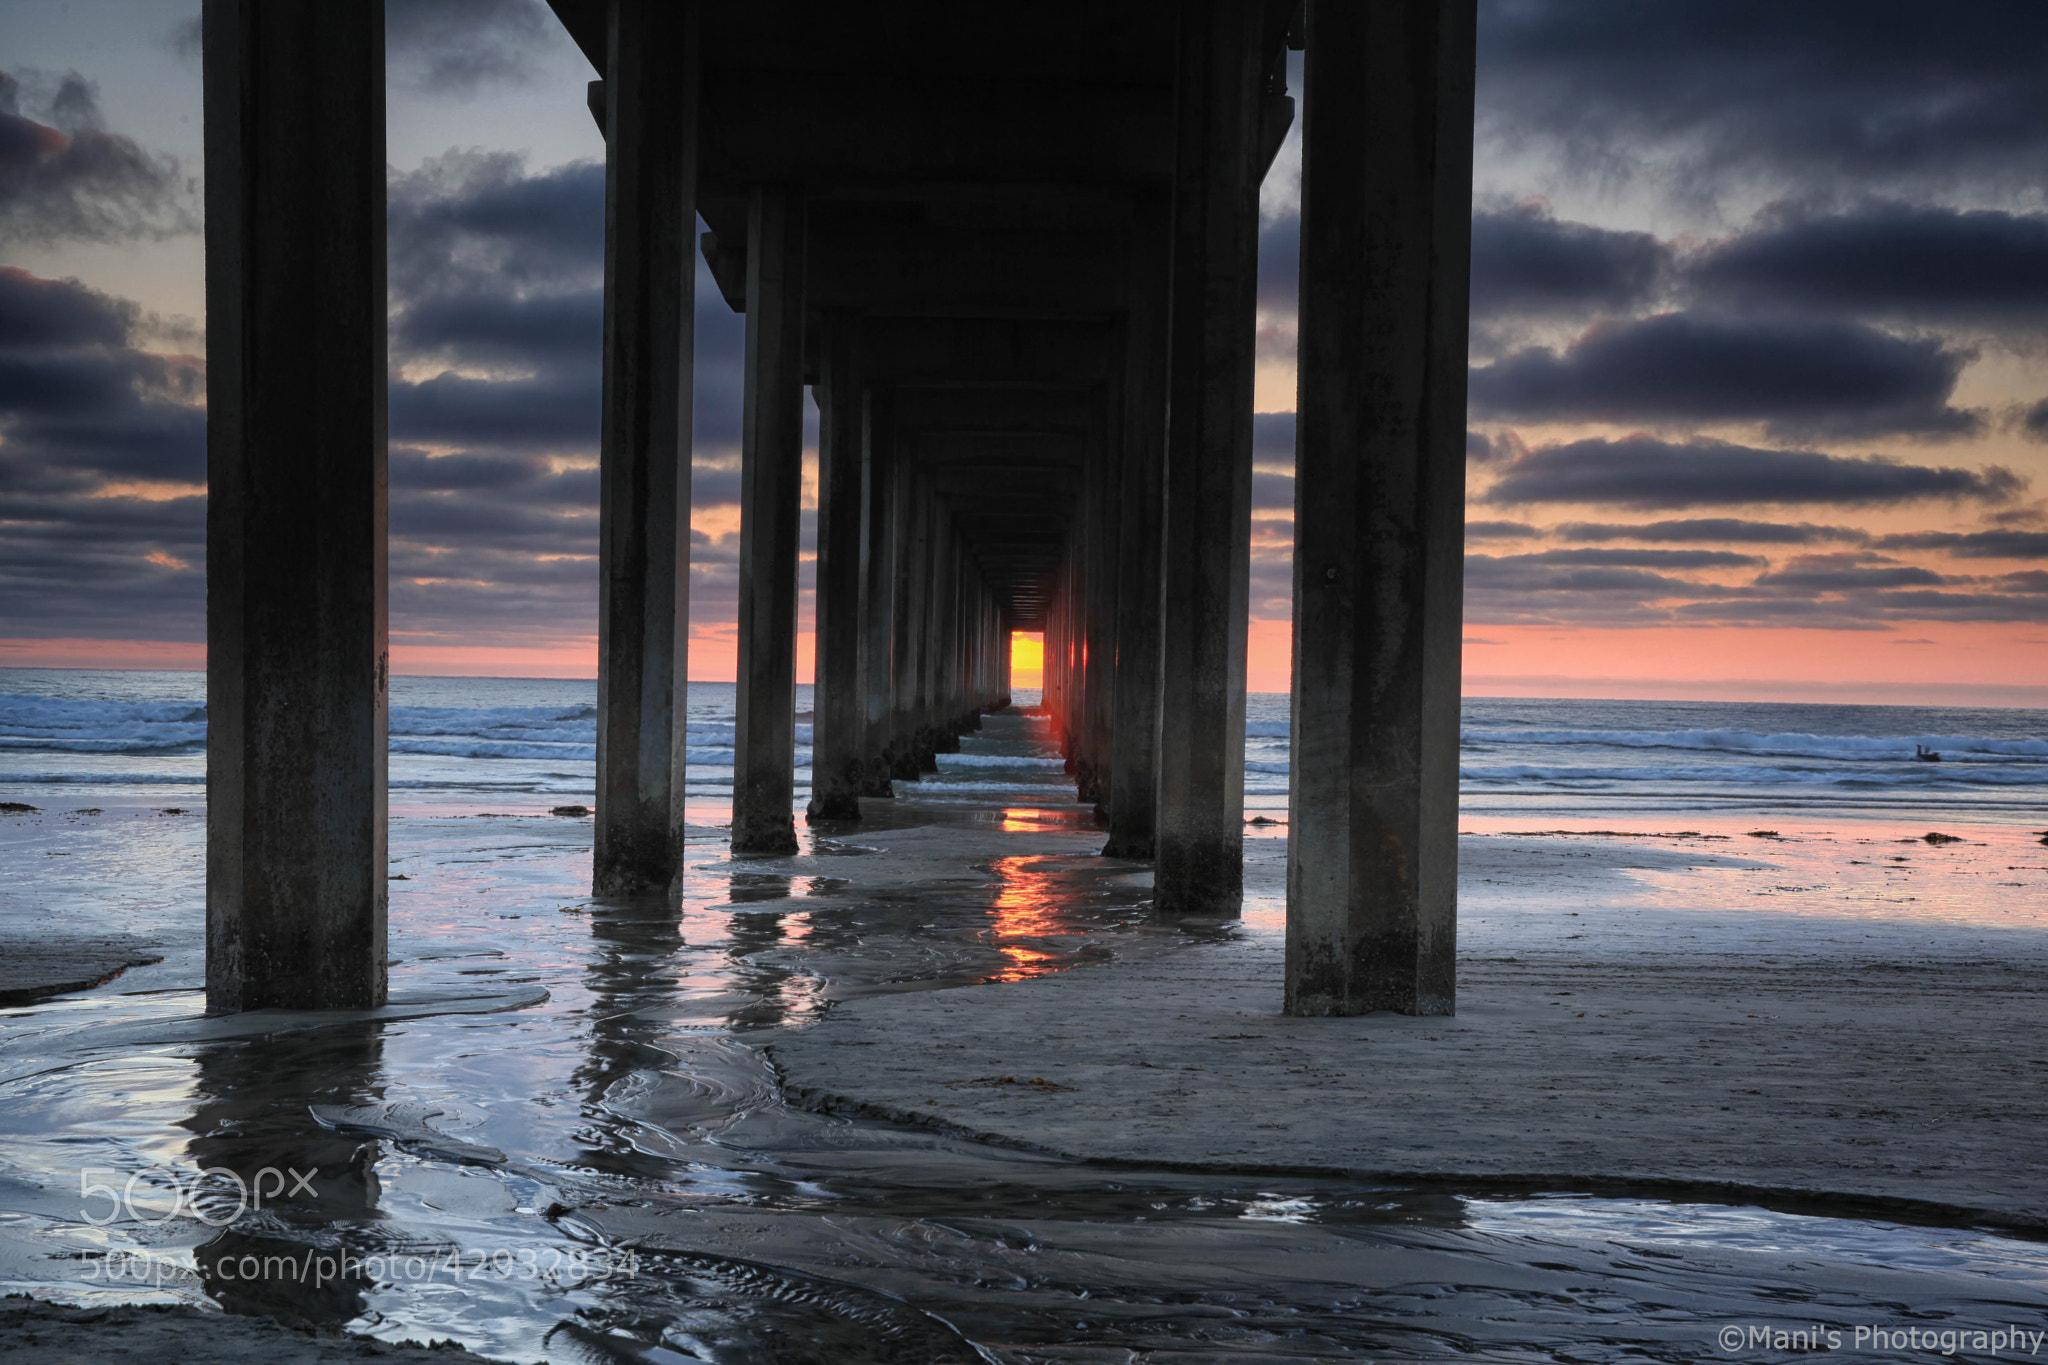 Photograph Last Light of the Day! by Manigandan Govindasamy on 500px